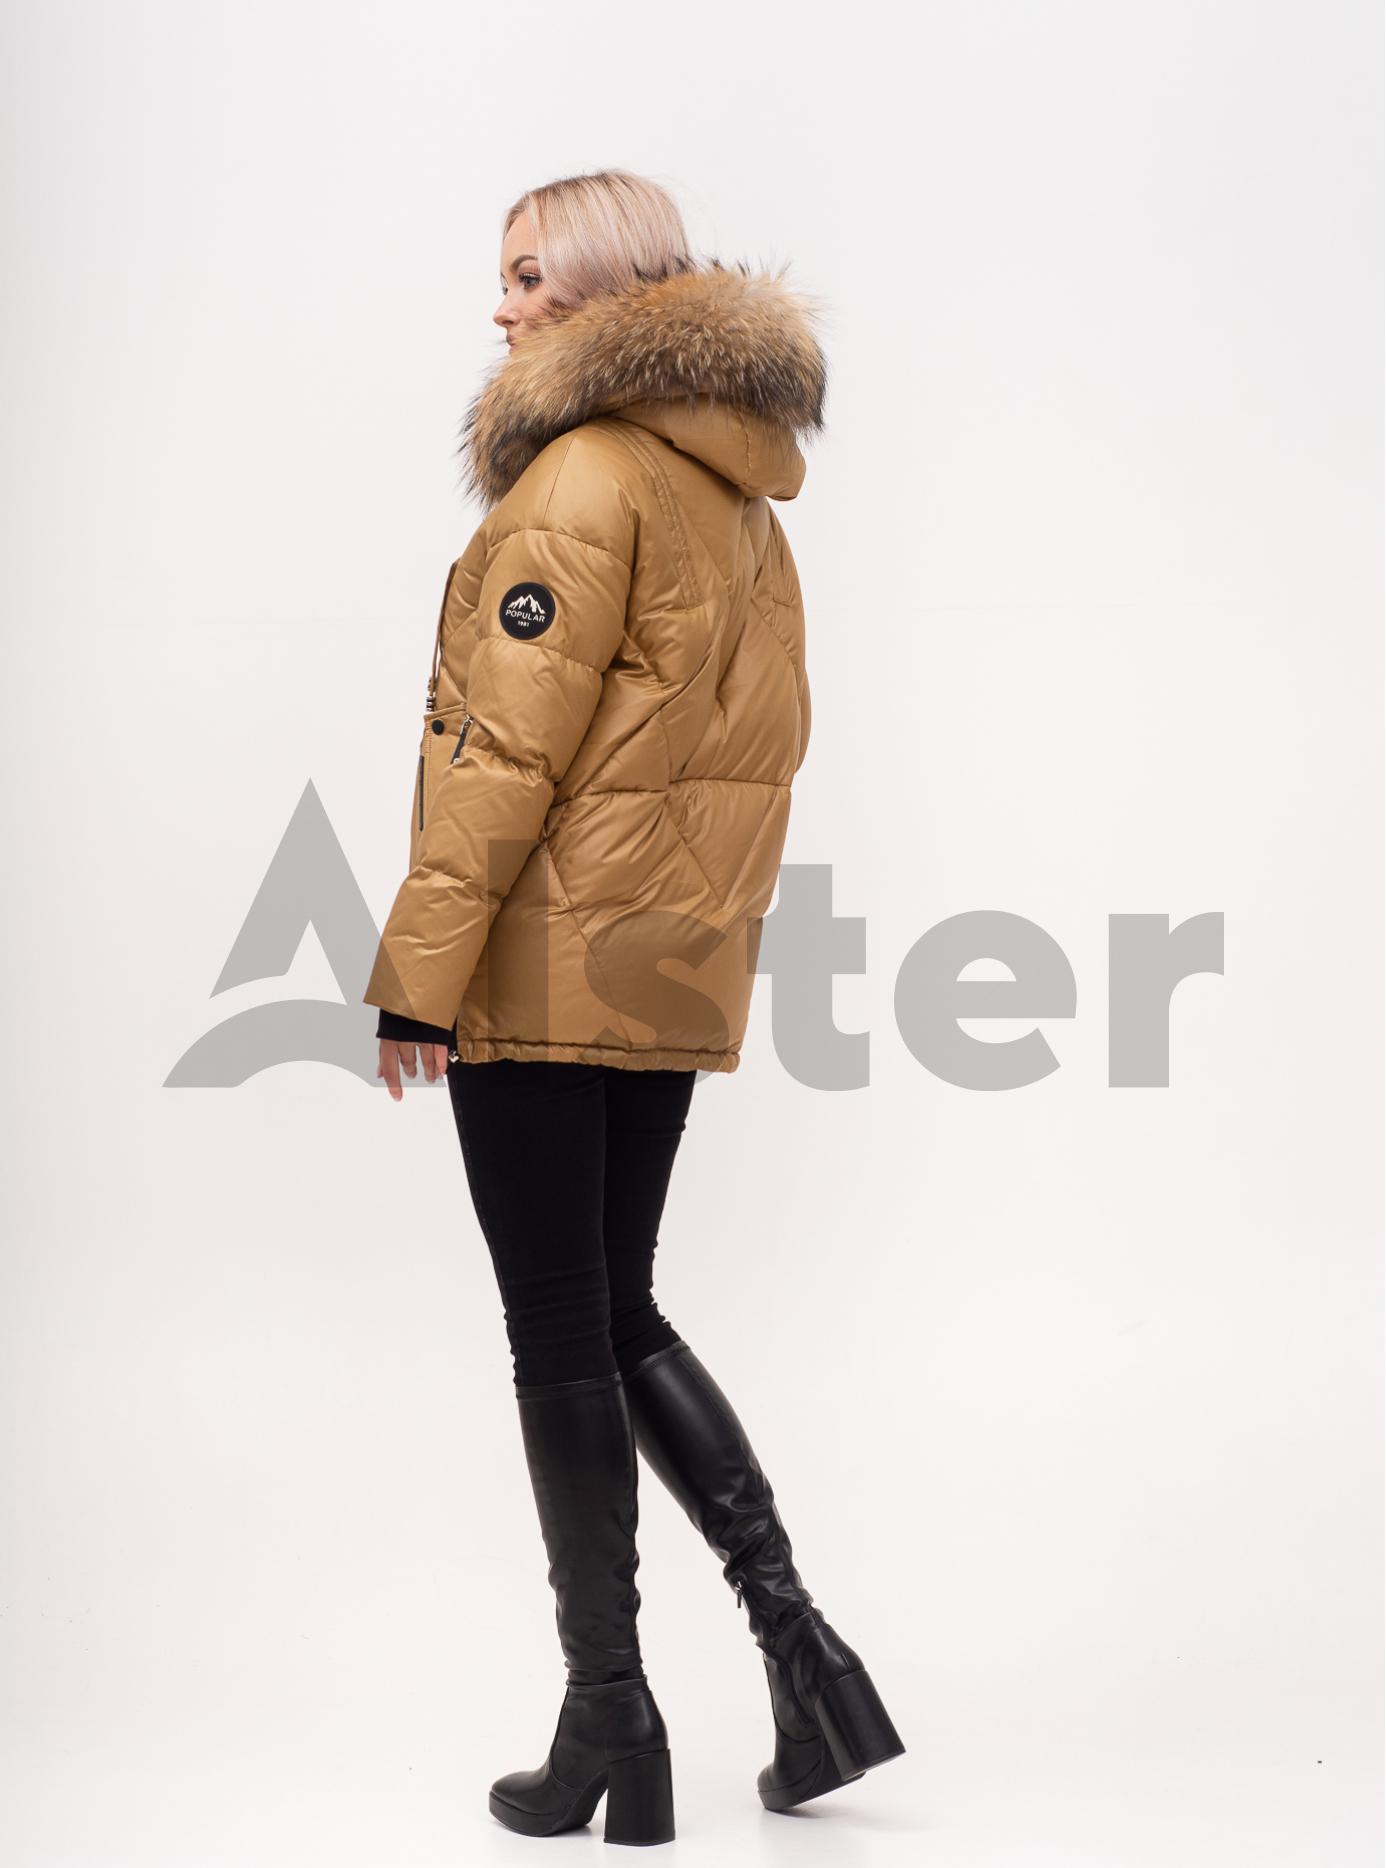 Пуховик зимний короткий с мехом енота Золотой M (02-N200386): фото - Alster.ua